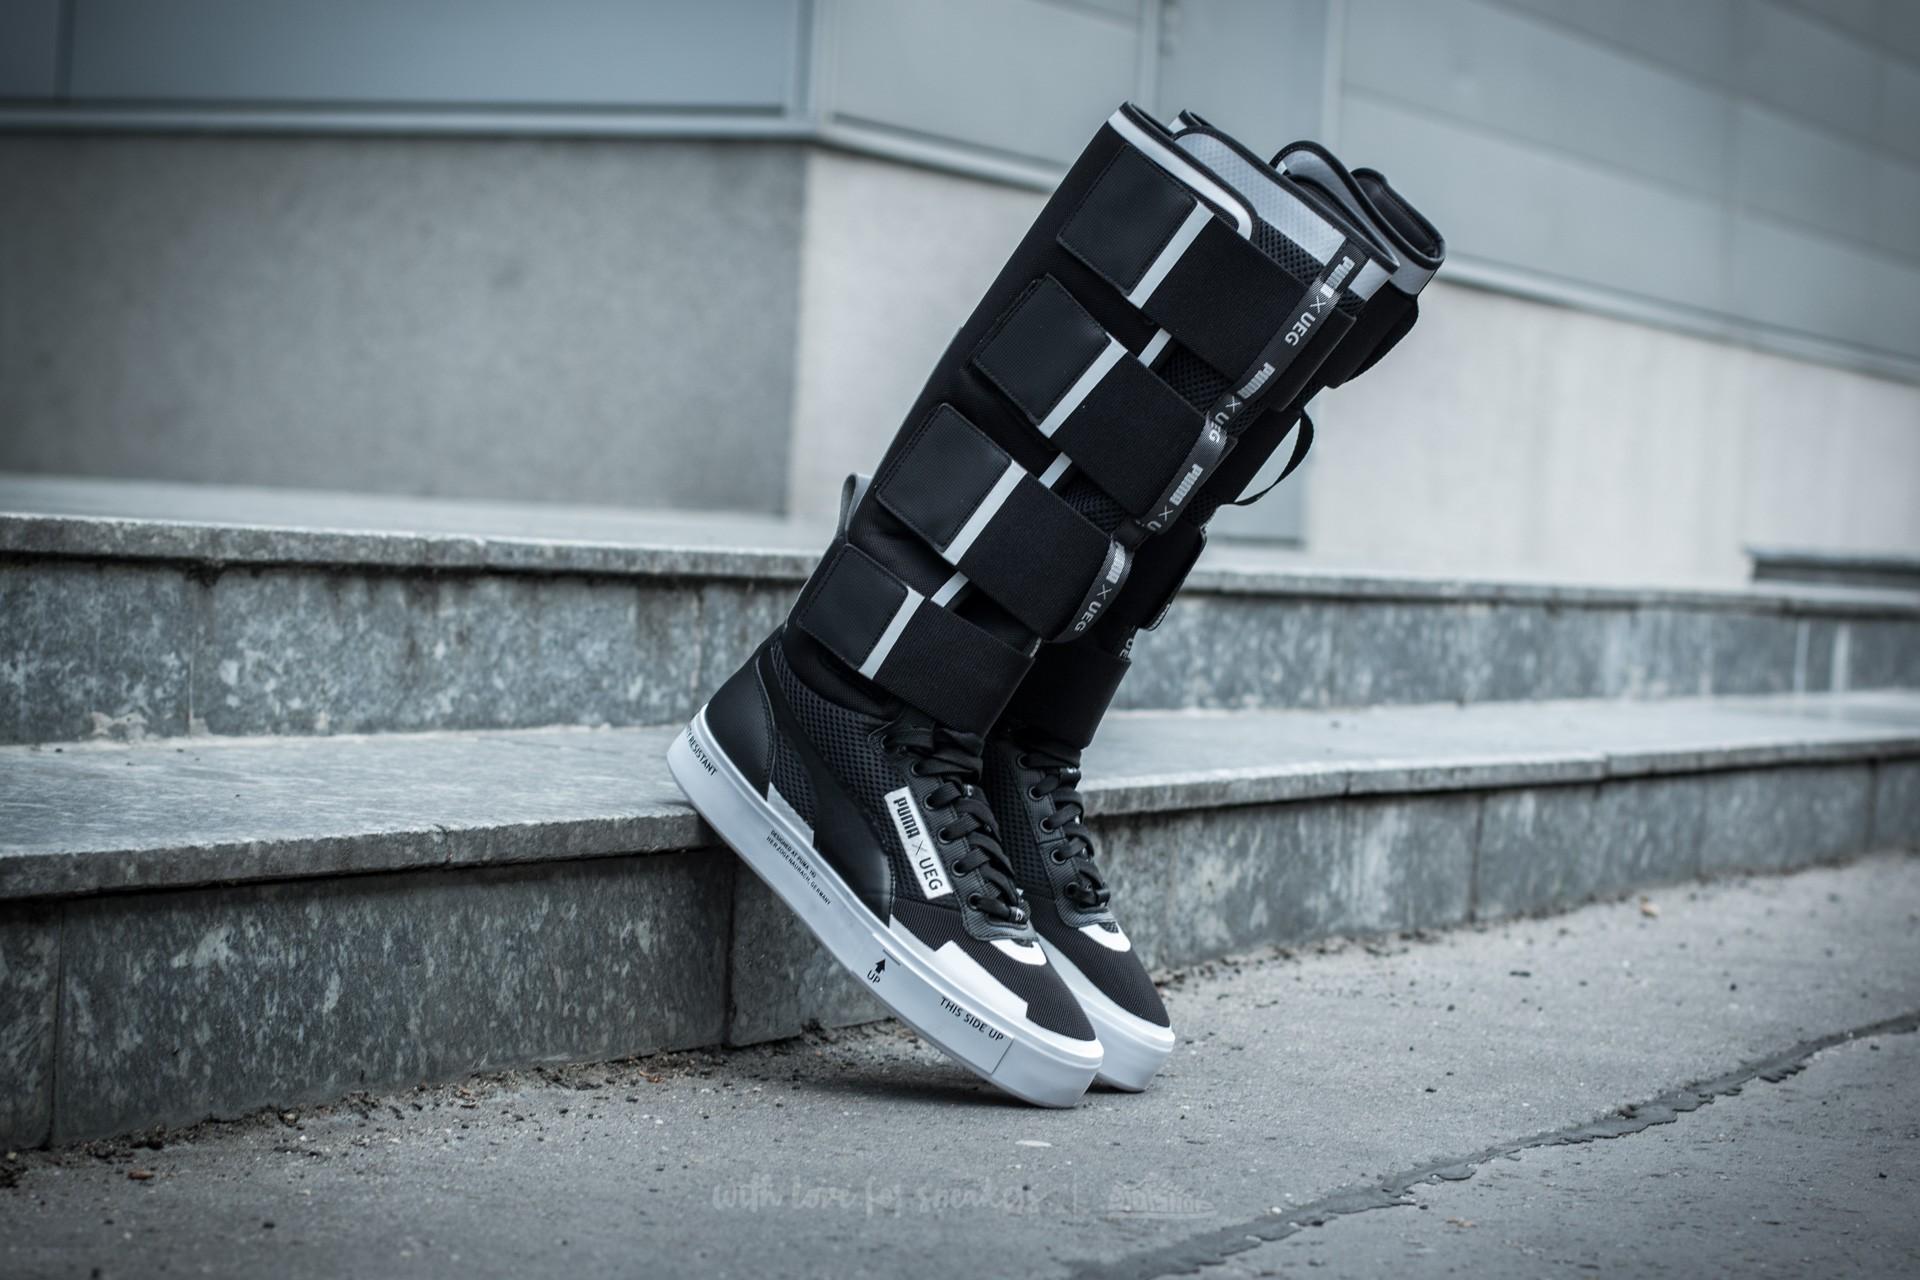 Puma X Ueg Sneakers